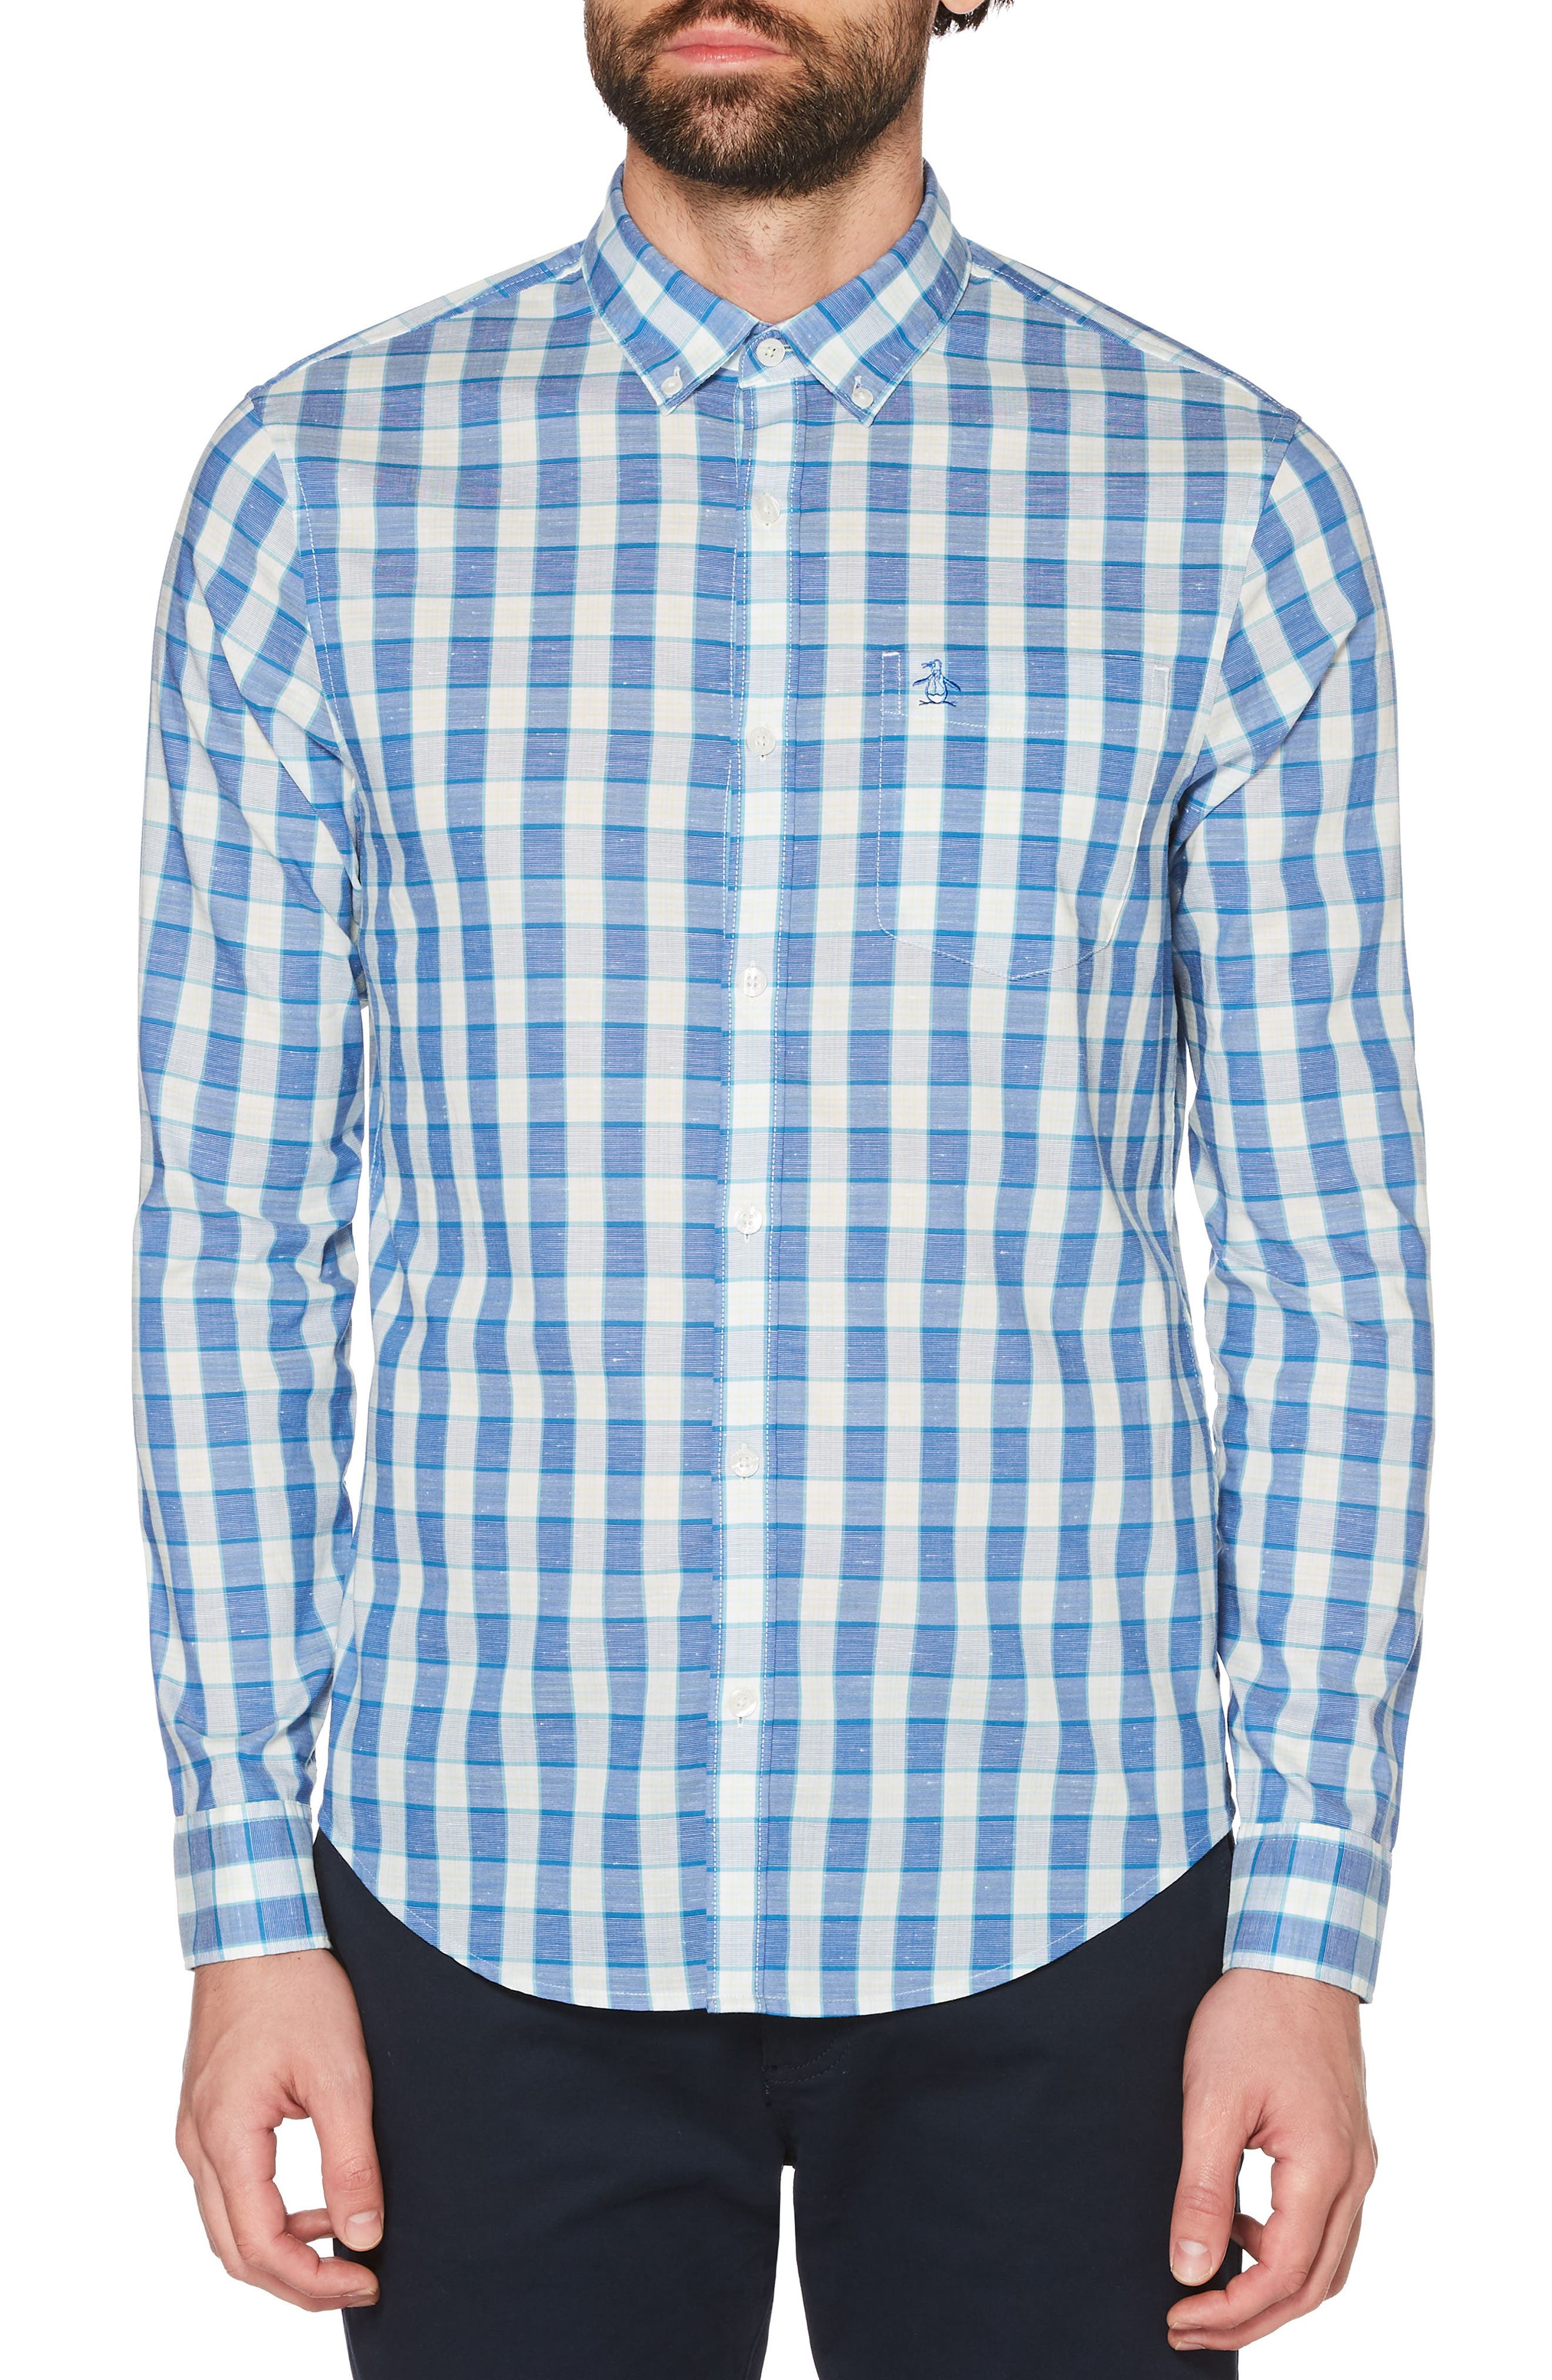 Nep Plaid Woven Shirt,                             Main thumbnail 1, color,                             Turkish Sea